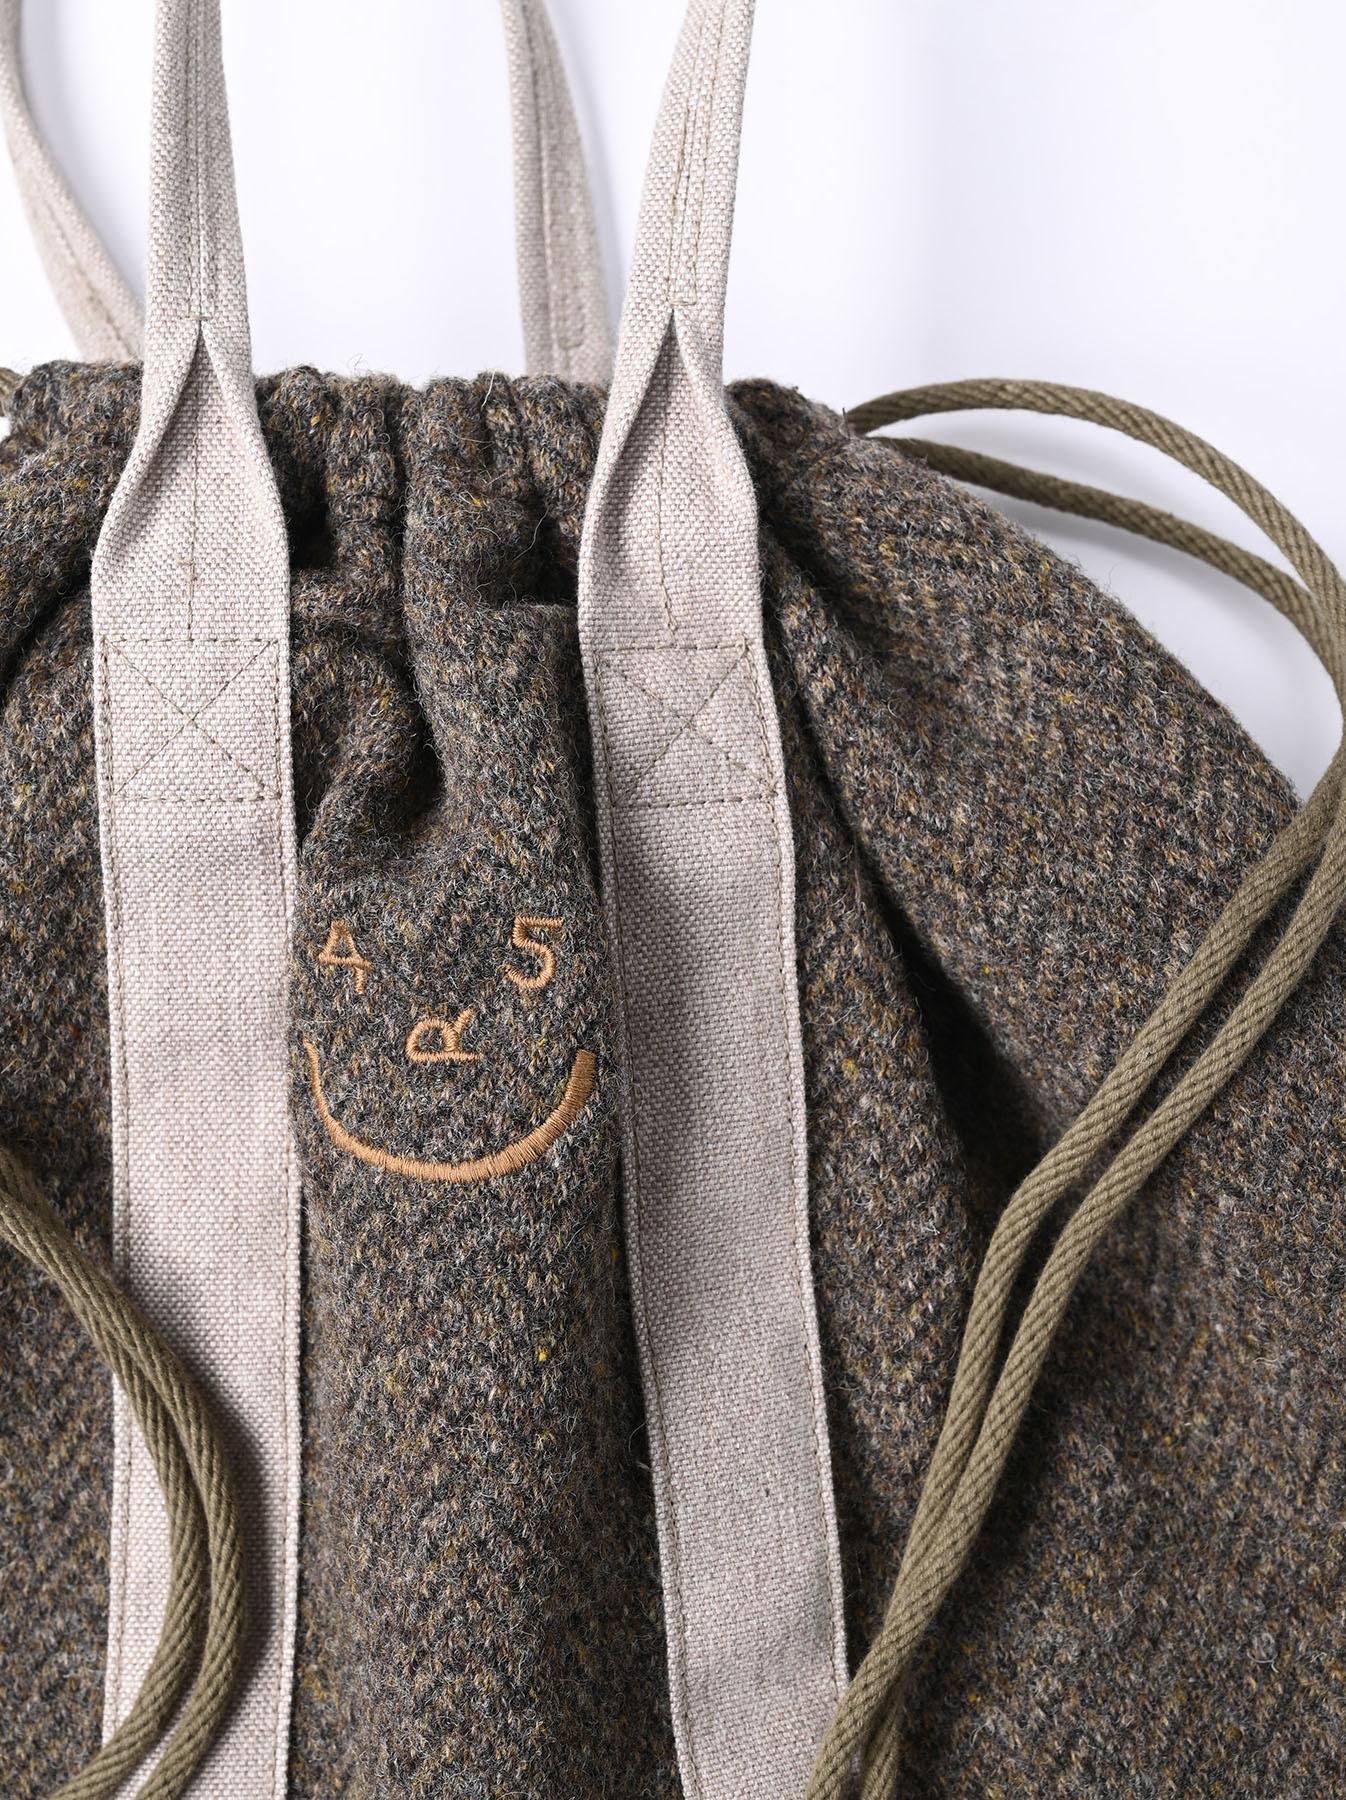 Tweed Knit and Nylon Tote Bag-7